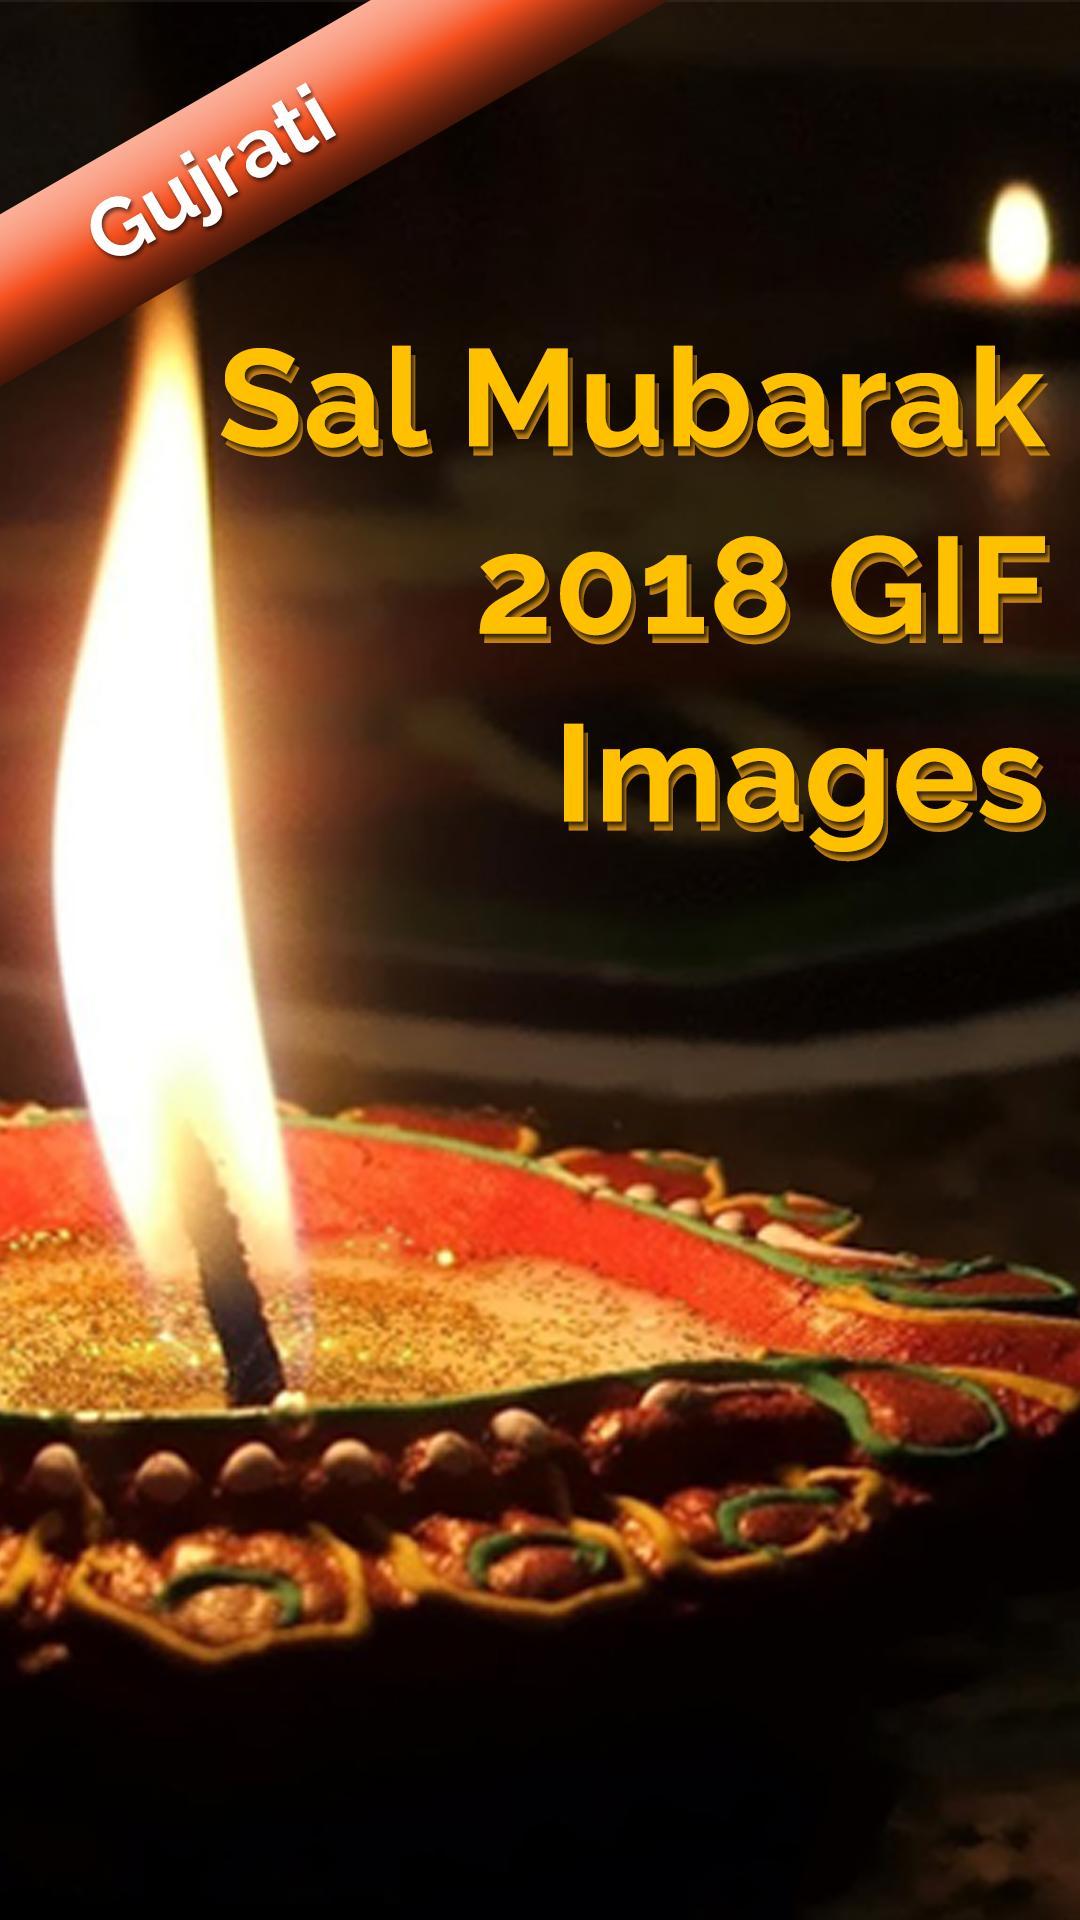 Happy New Year Sal Mubarak 54